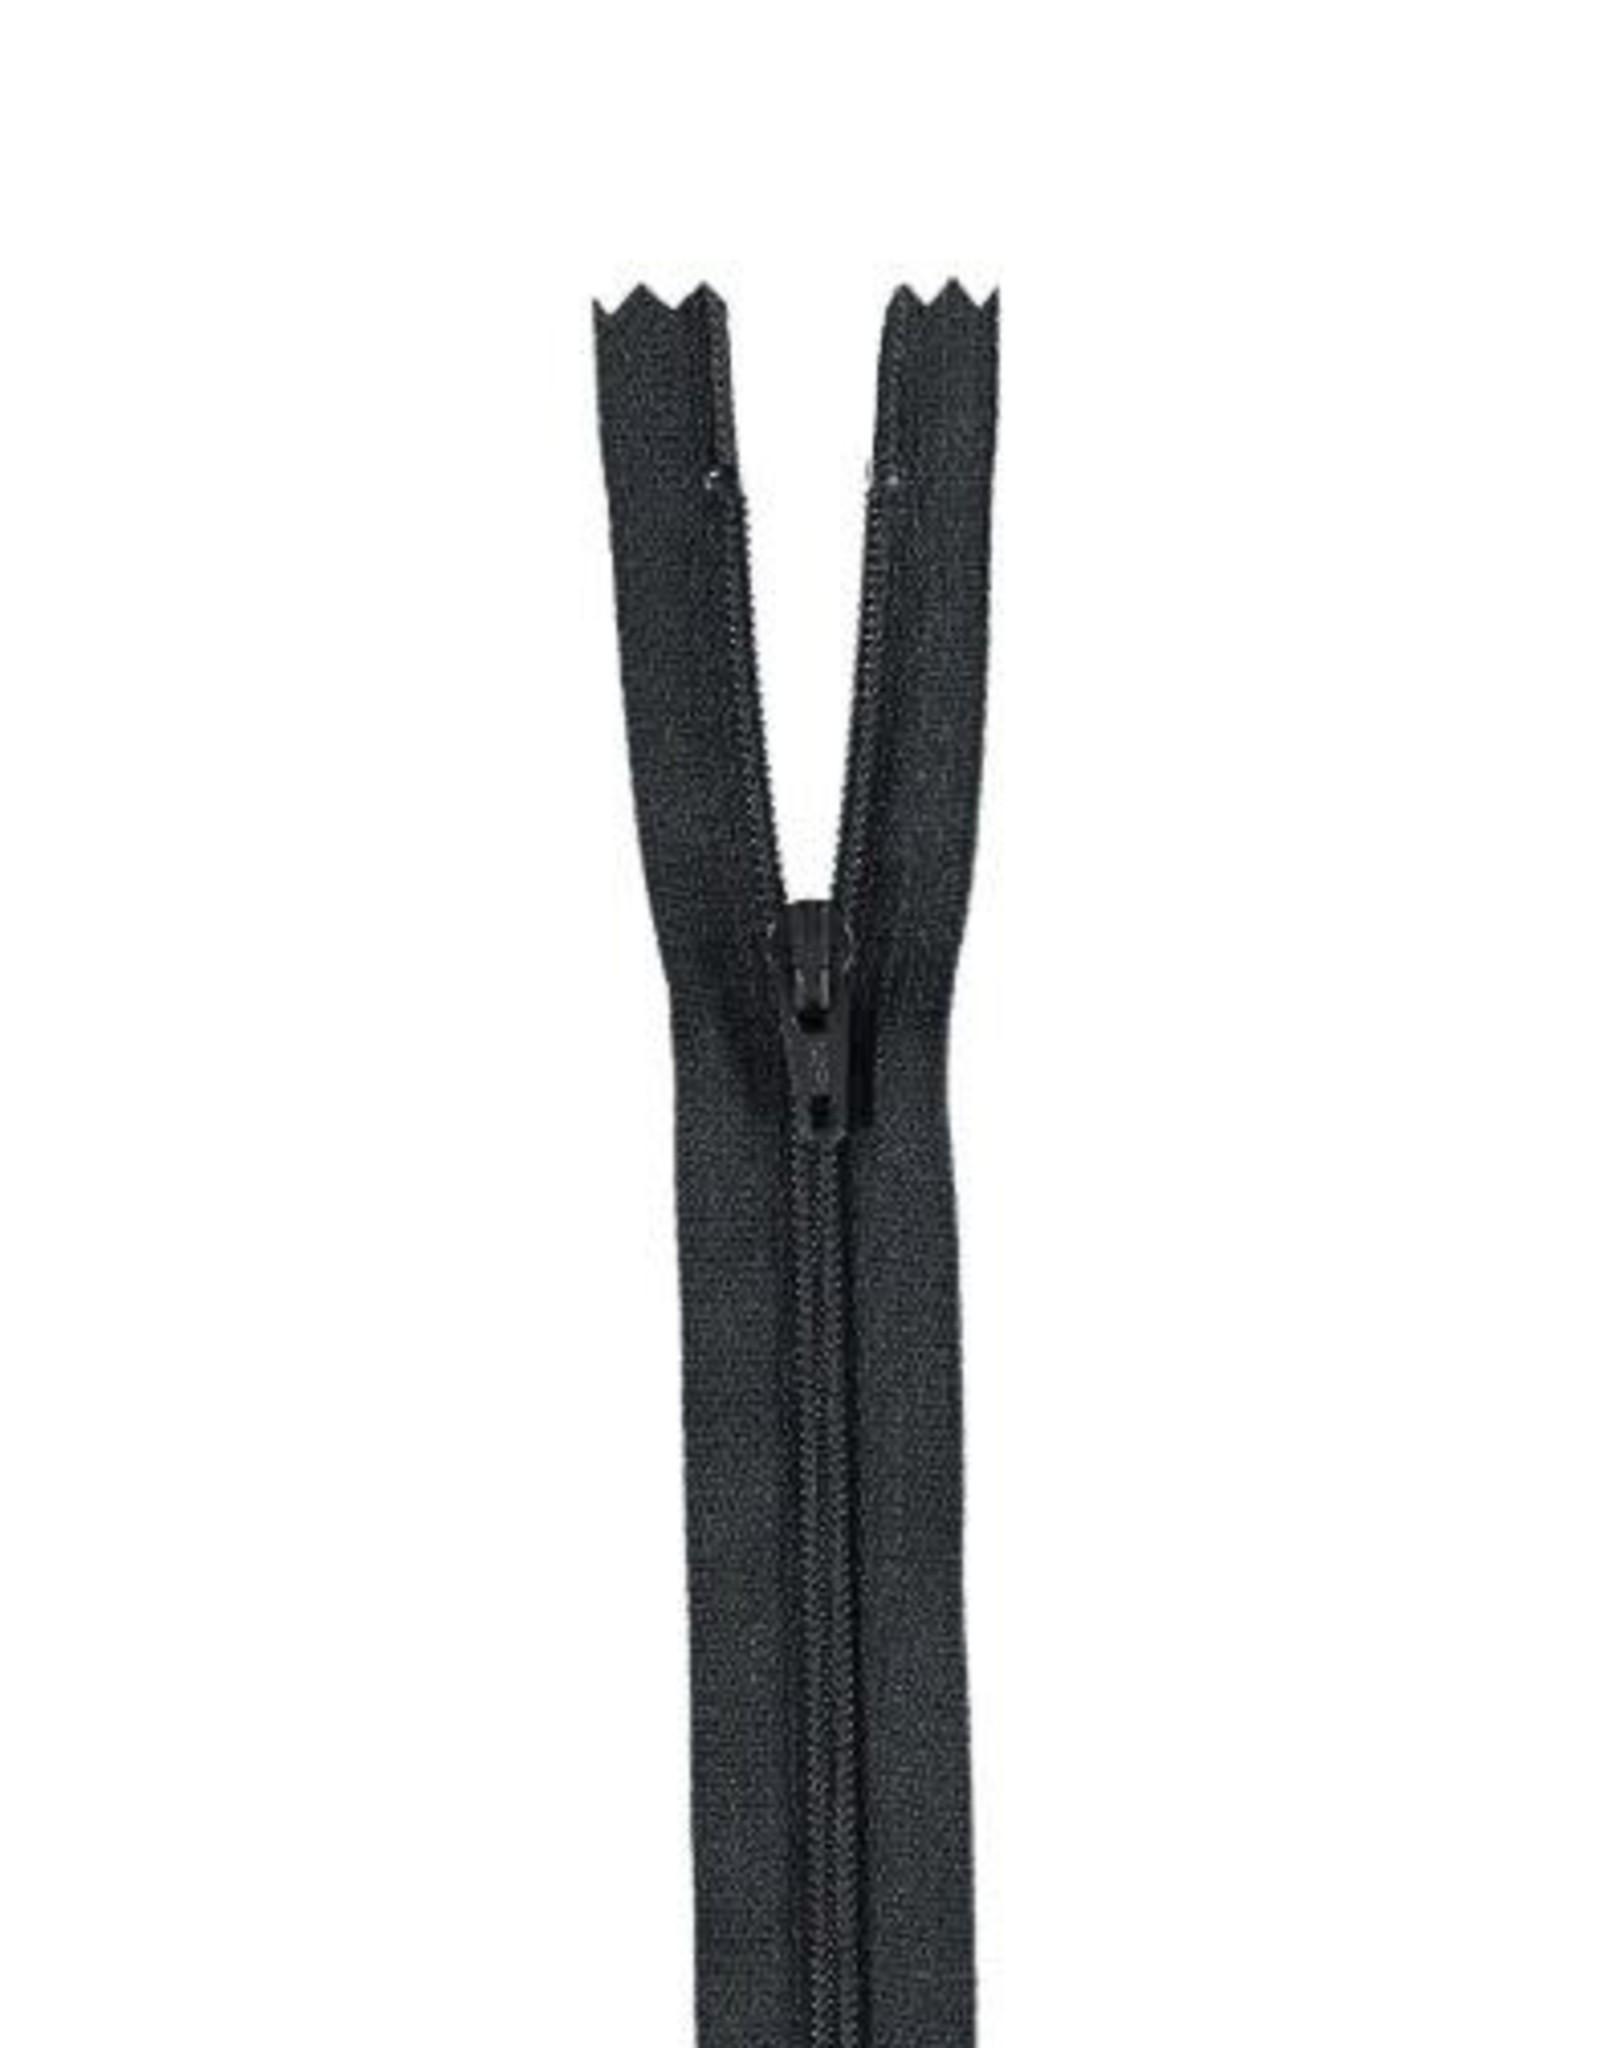 YKK Spiraalrits niet-DB 3mm antraciet 156-40cm